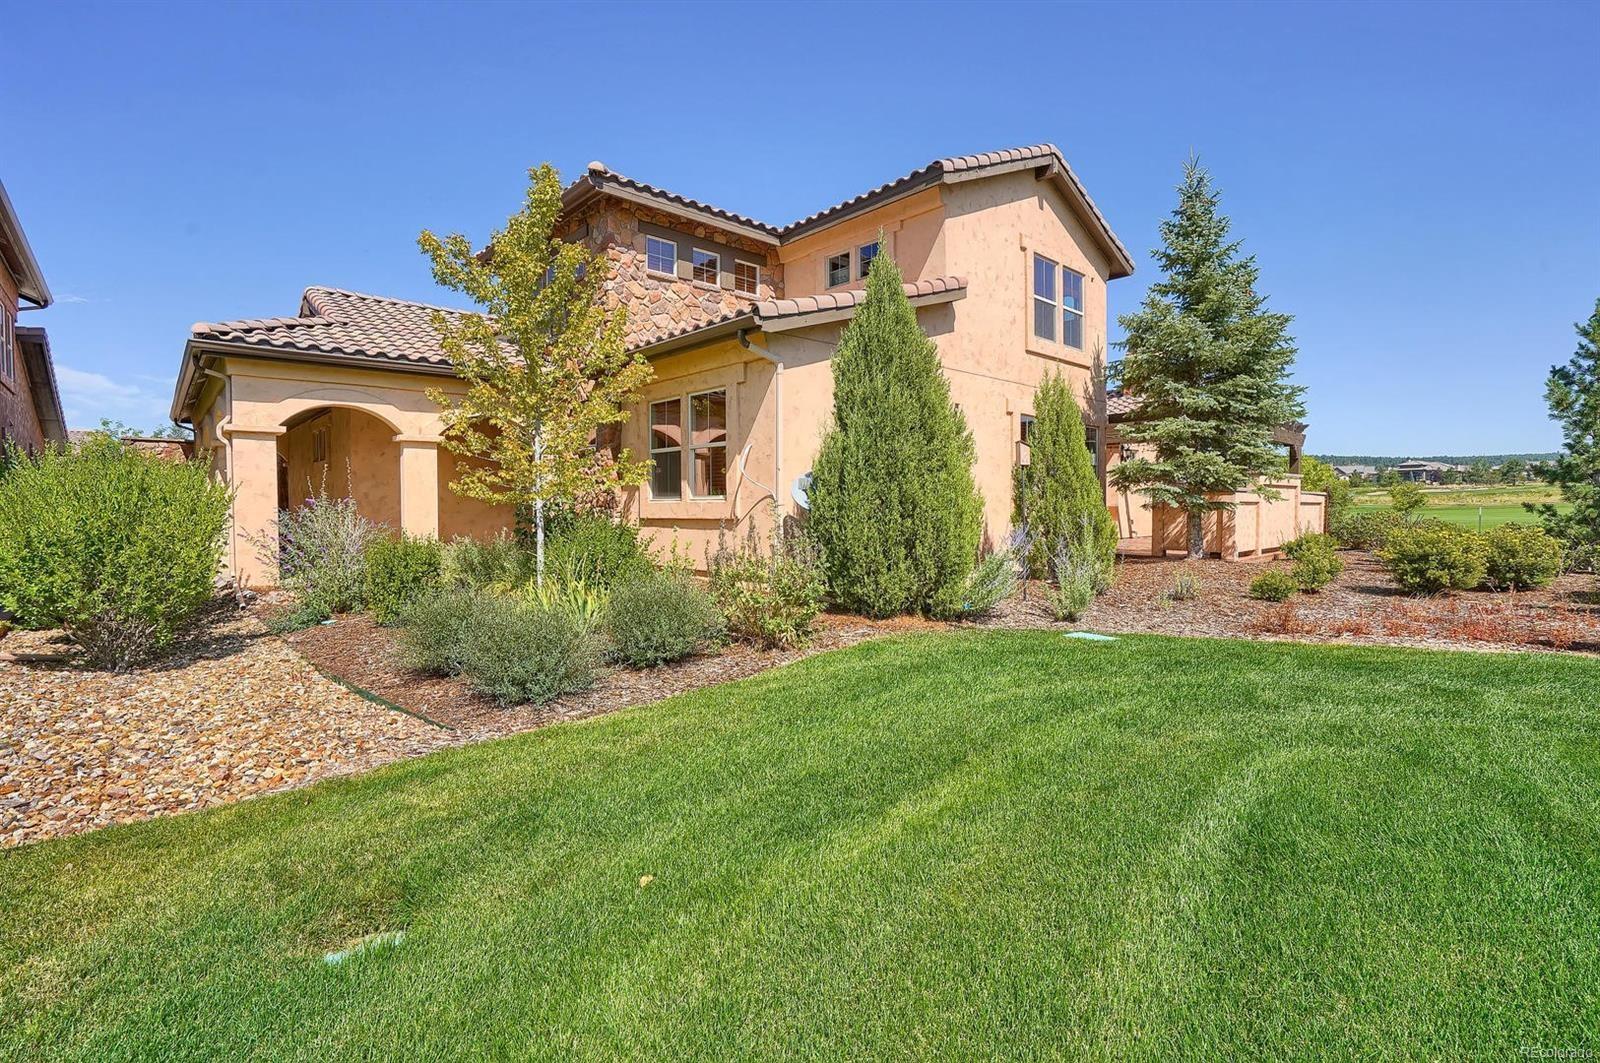 MLS# 7383029 - 39 - 2276 Rocking Horse Court, Colorado Springs, CO 80921